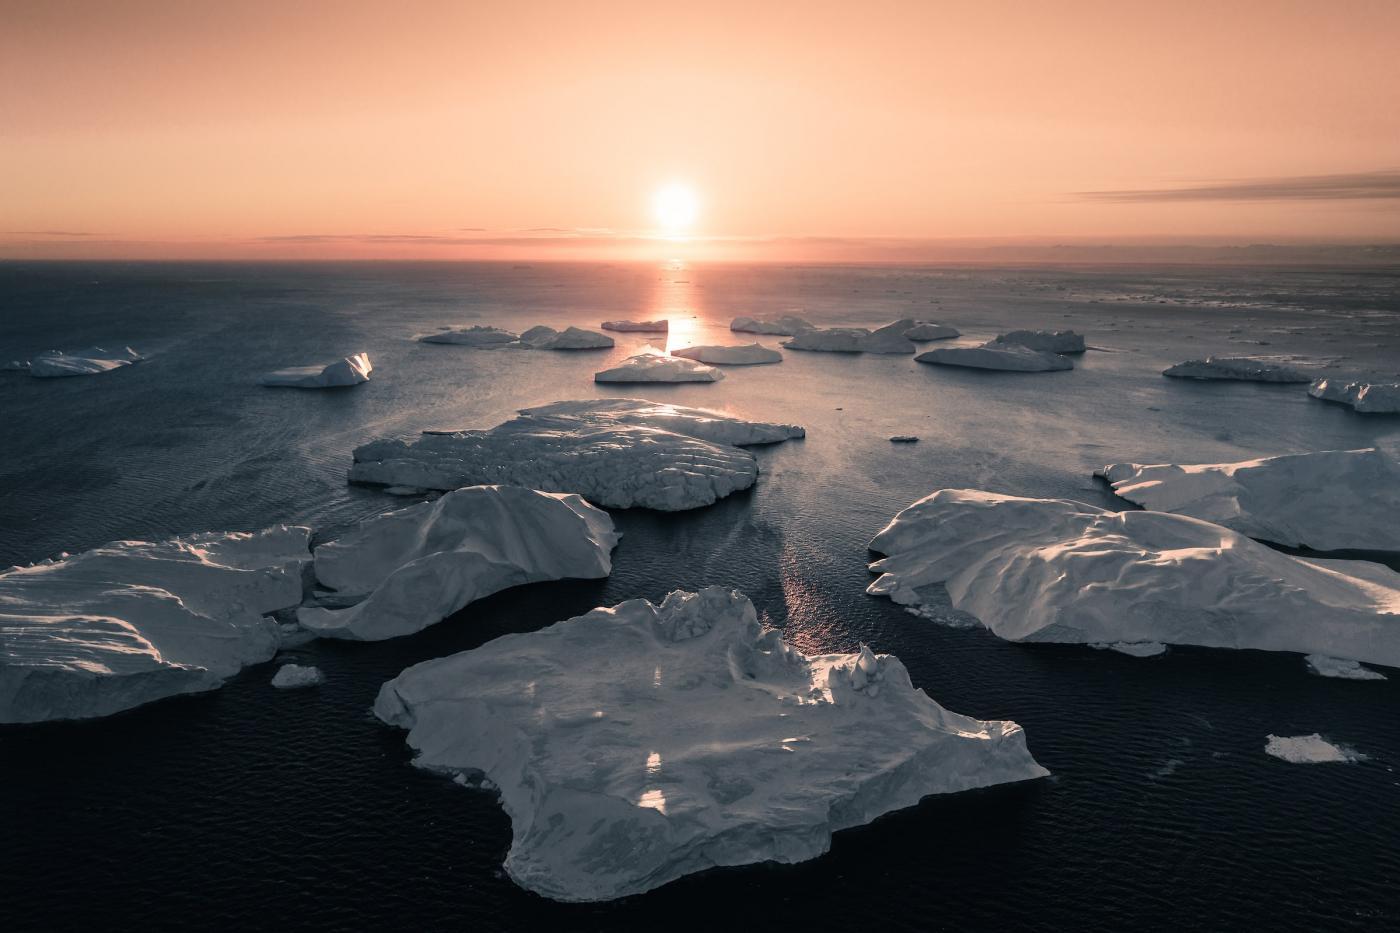 Sun aligned with icebergs in Ilulissat. Photo - Ben S. Rehn, Visit Greenland